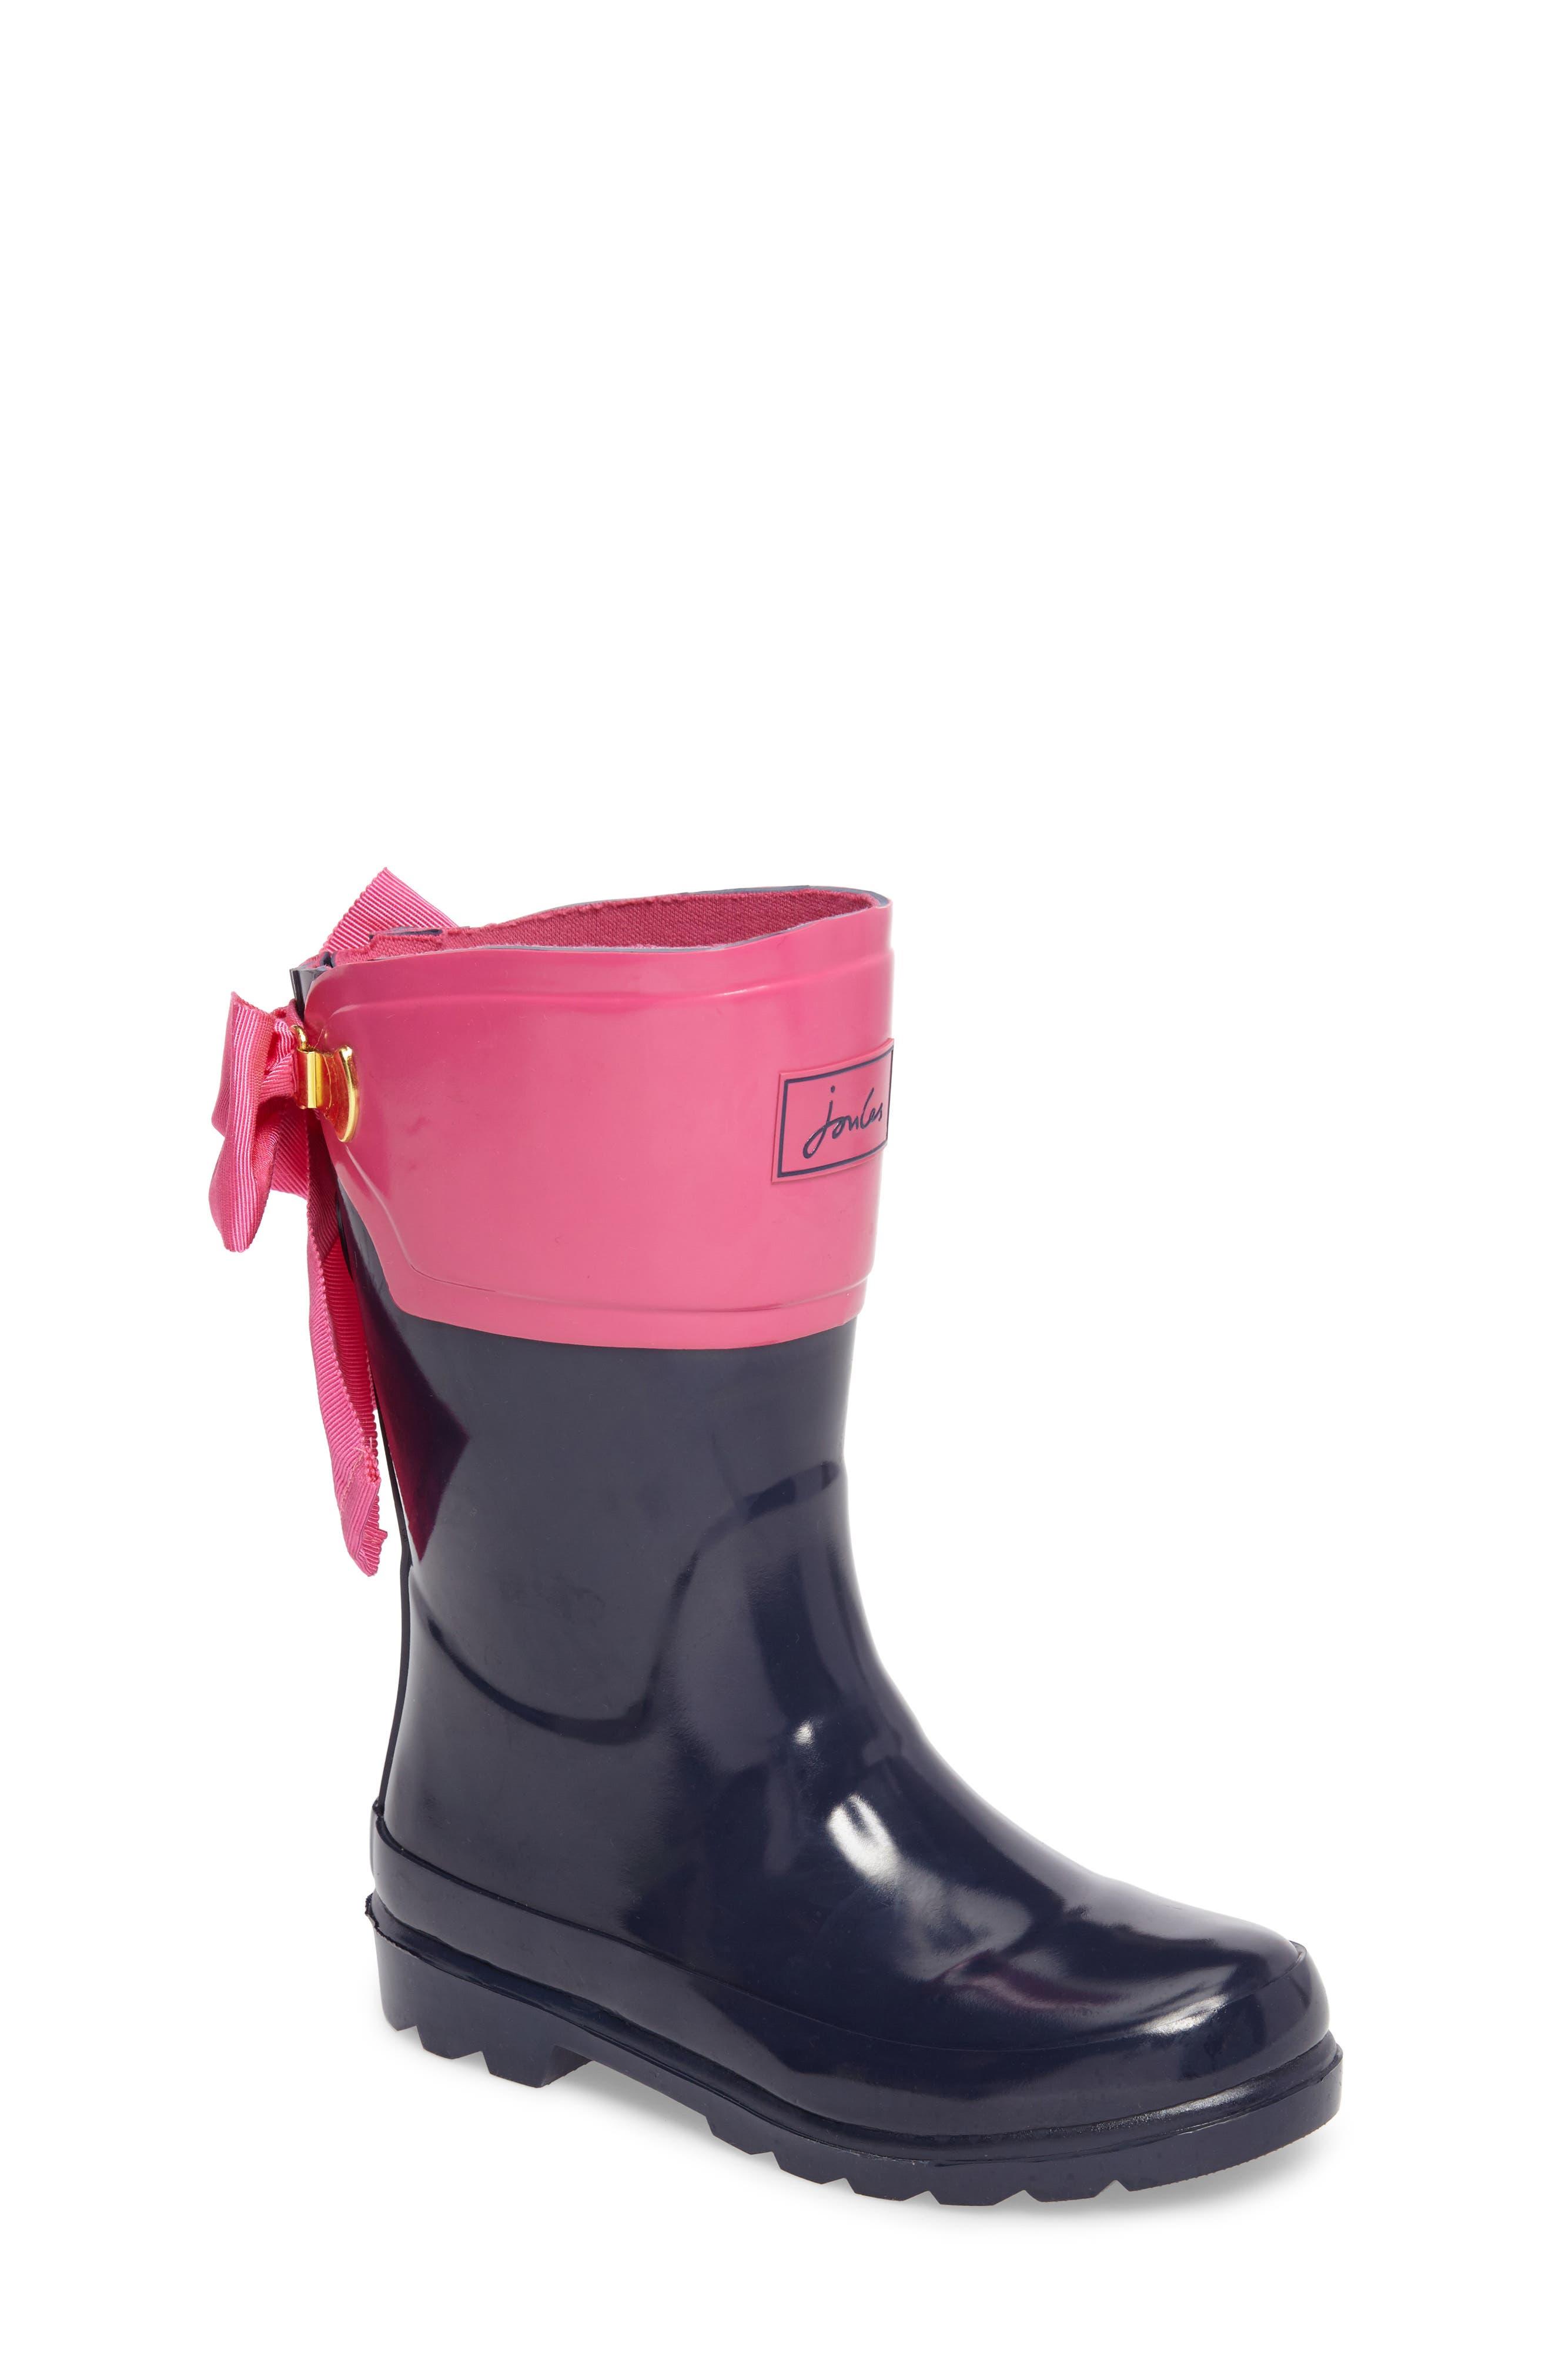 Evedon Bow Waterproof Rain Boot,                             Main thumbnail 1, color,                             French Navy